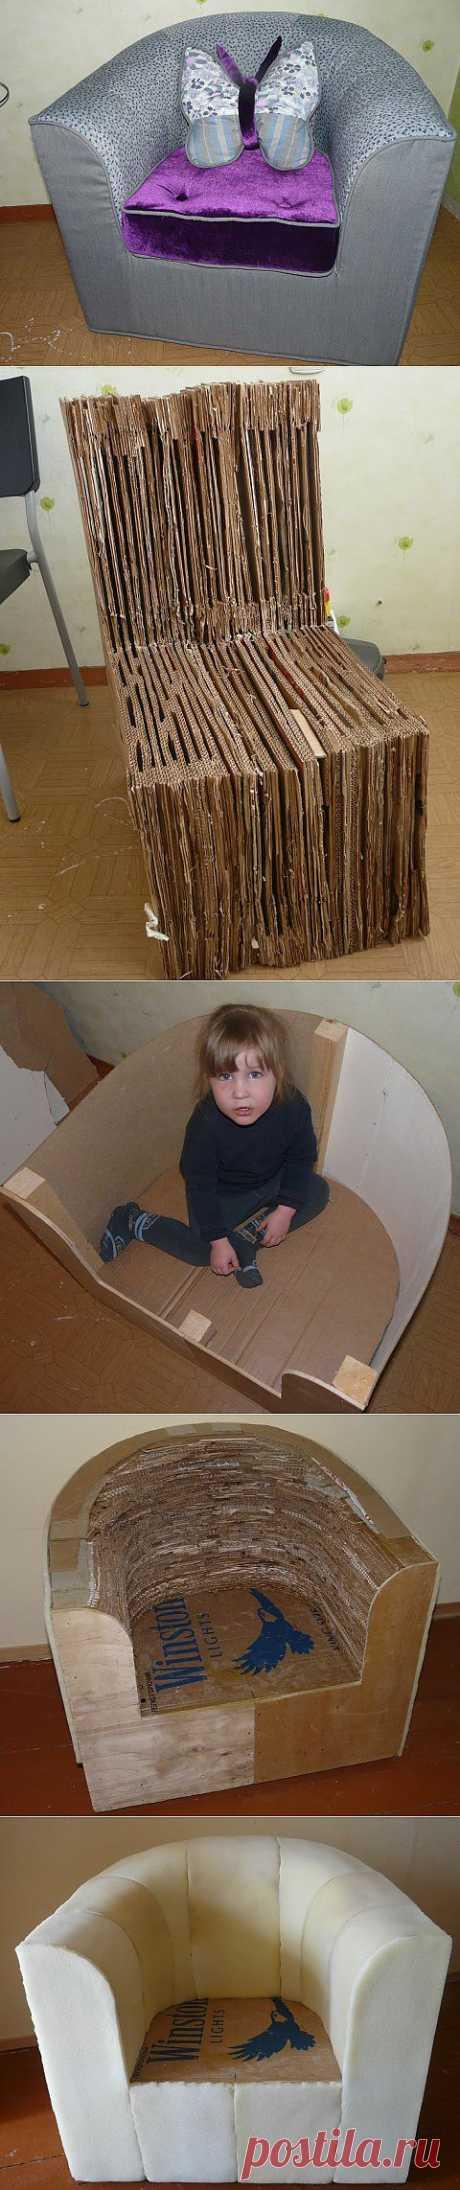 Кресло из картона.